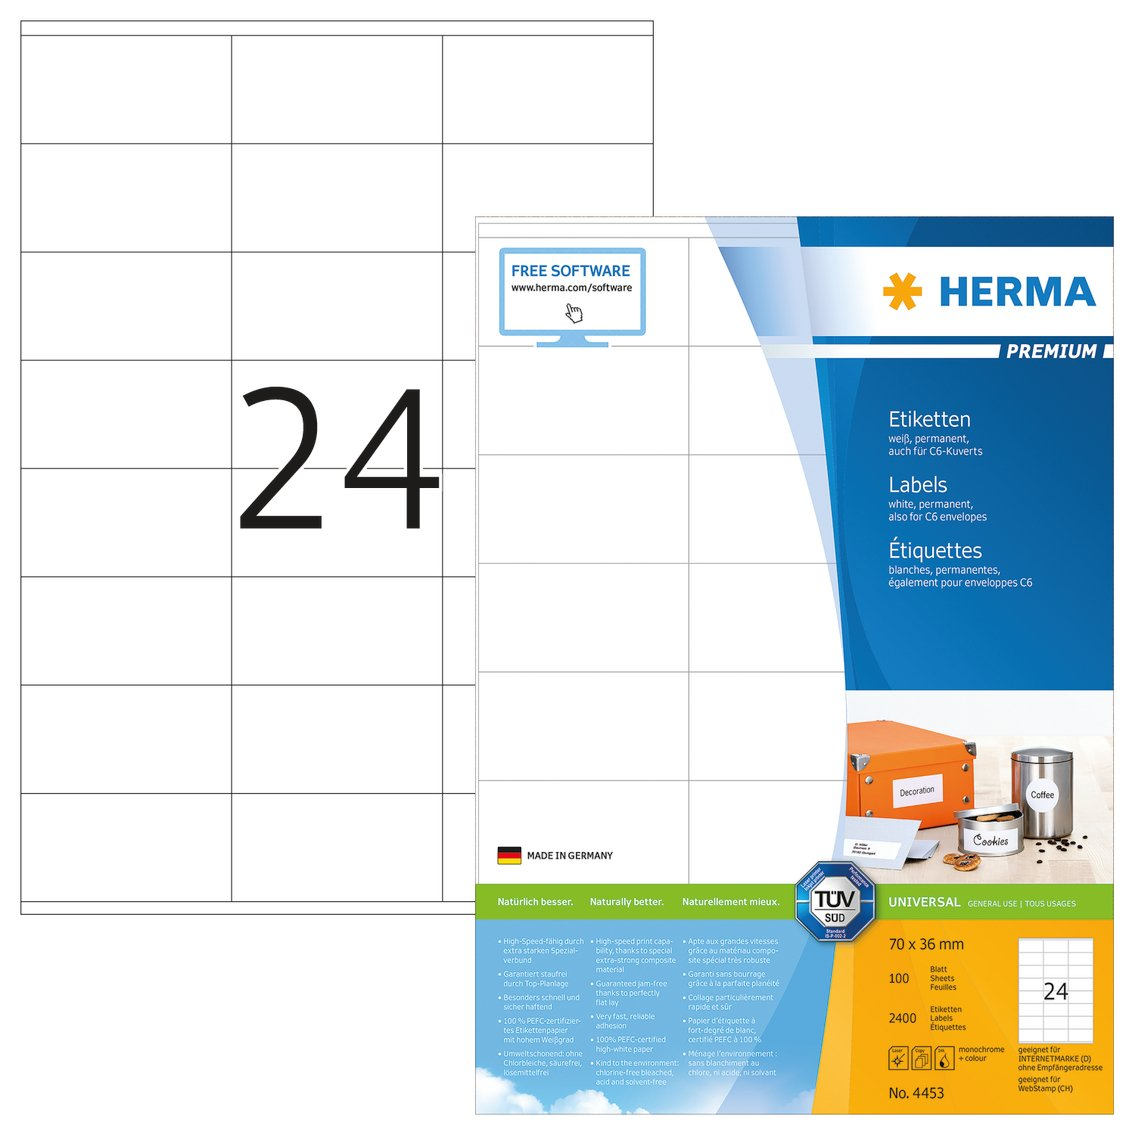 HERMA Universal Etichette Recycling, 70 x 36 mm 10823